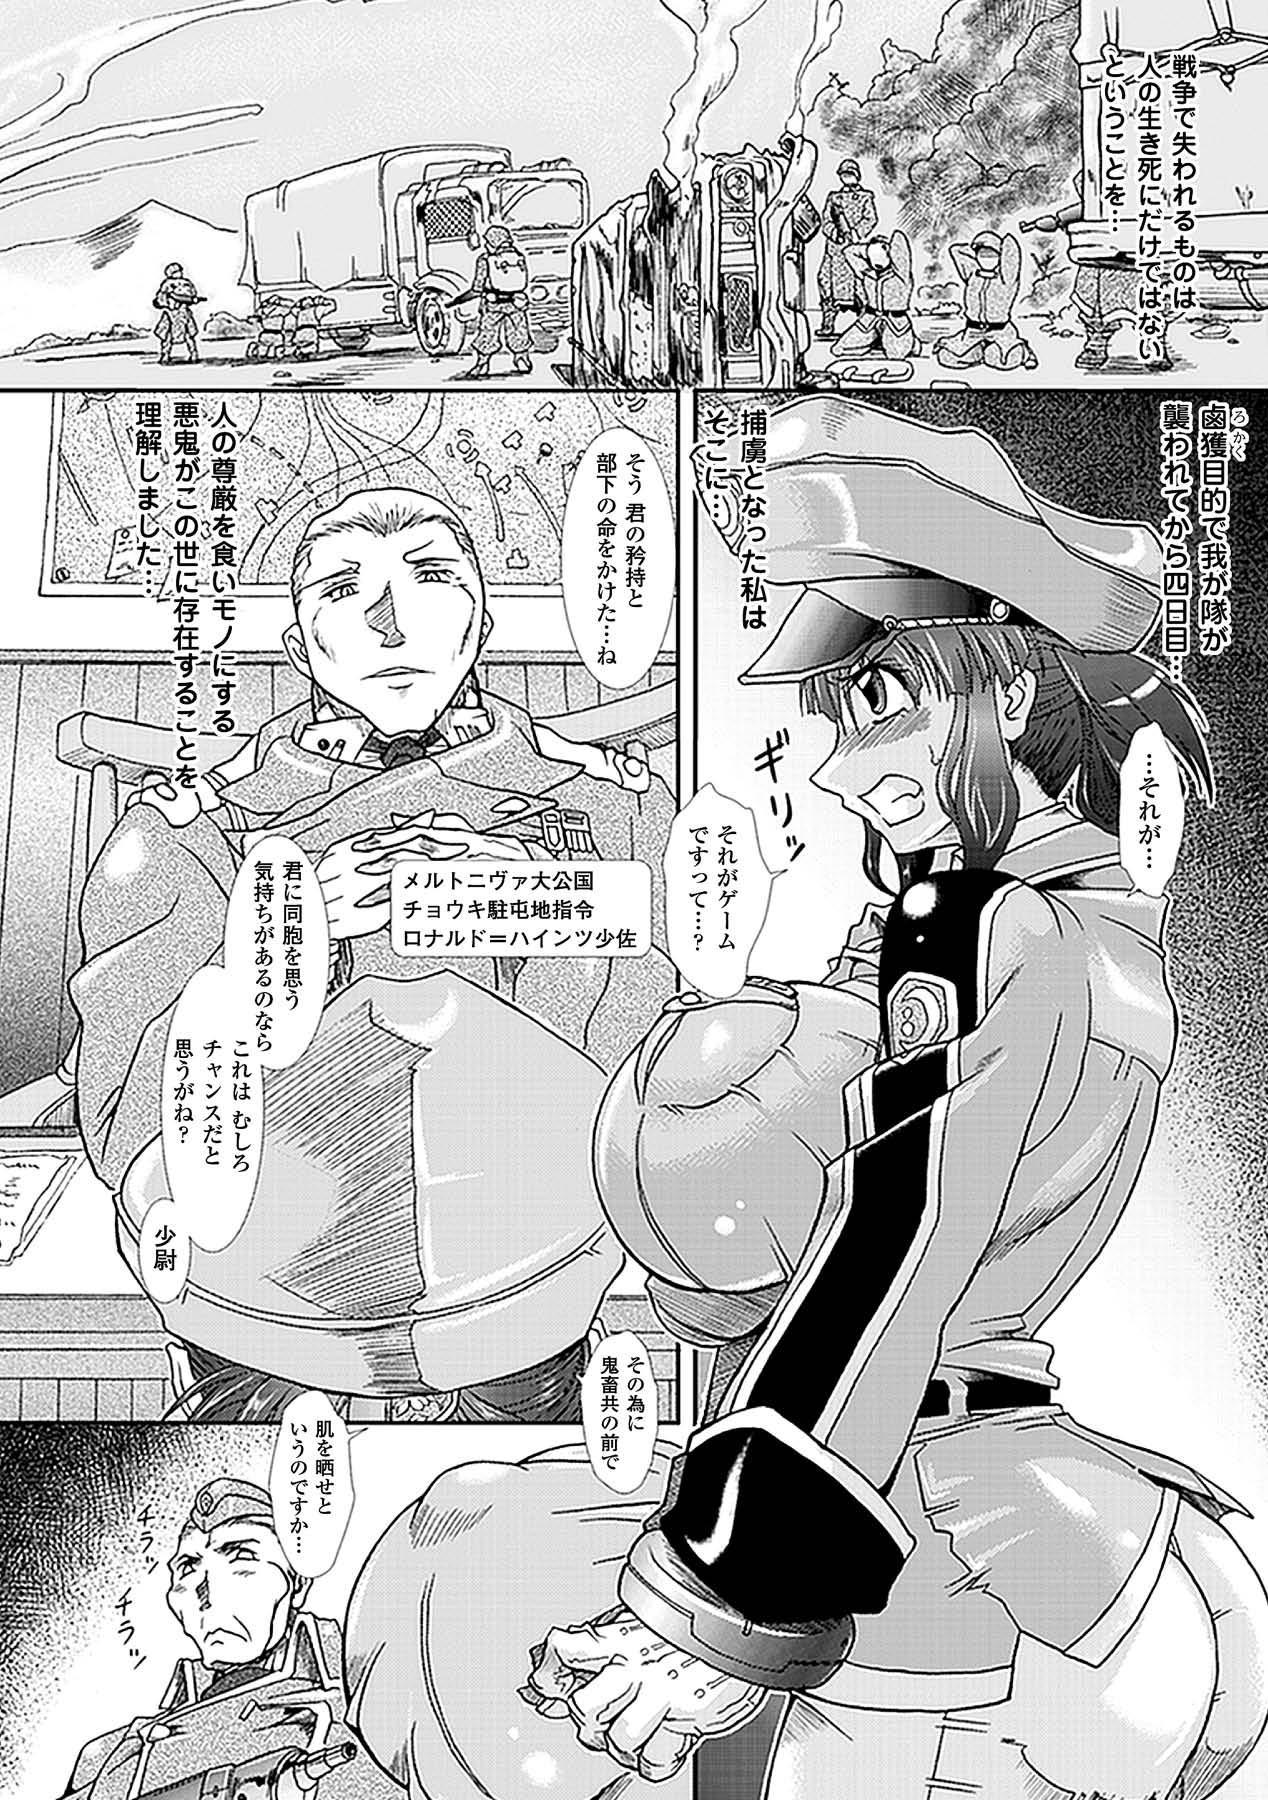 Kyousei Roshutsu Vol.1 Digital 45